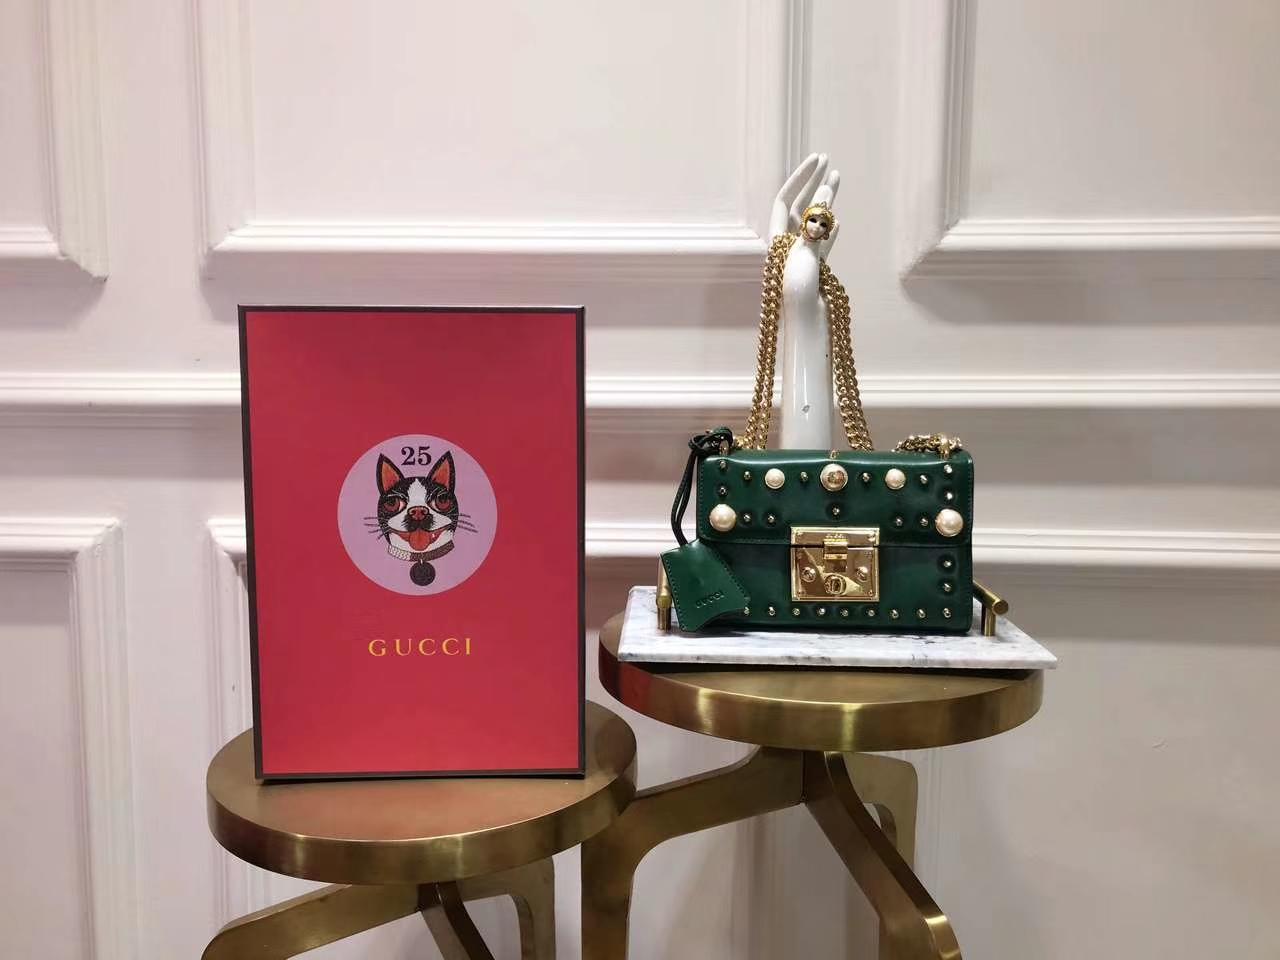 GUCCI(古驰)Padlock 432182 墨绿色 刺绣系列展现温婉动人 甜蜜特别的创意 20×15.5×5cm